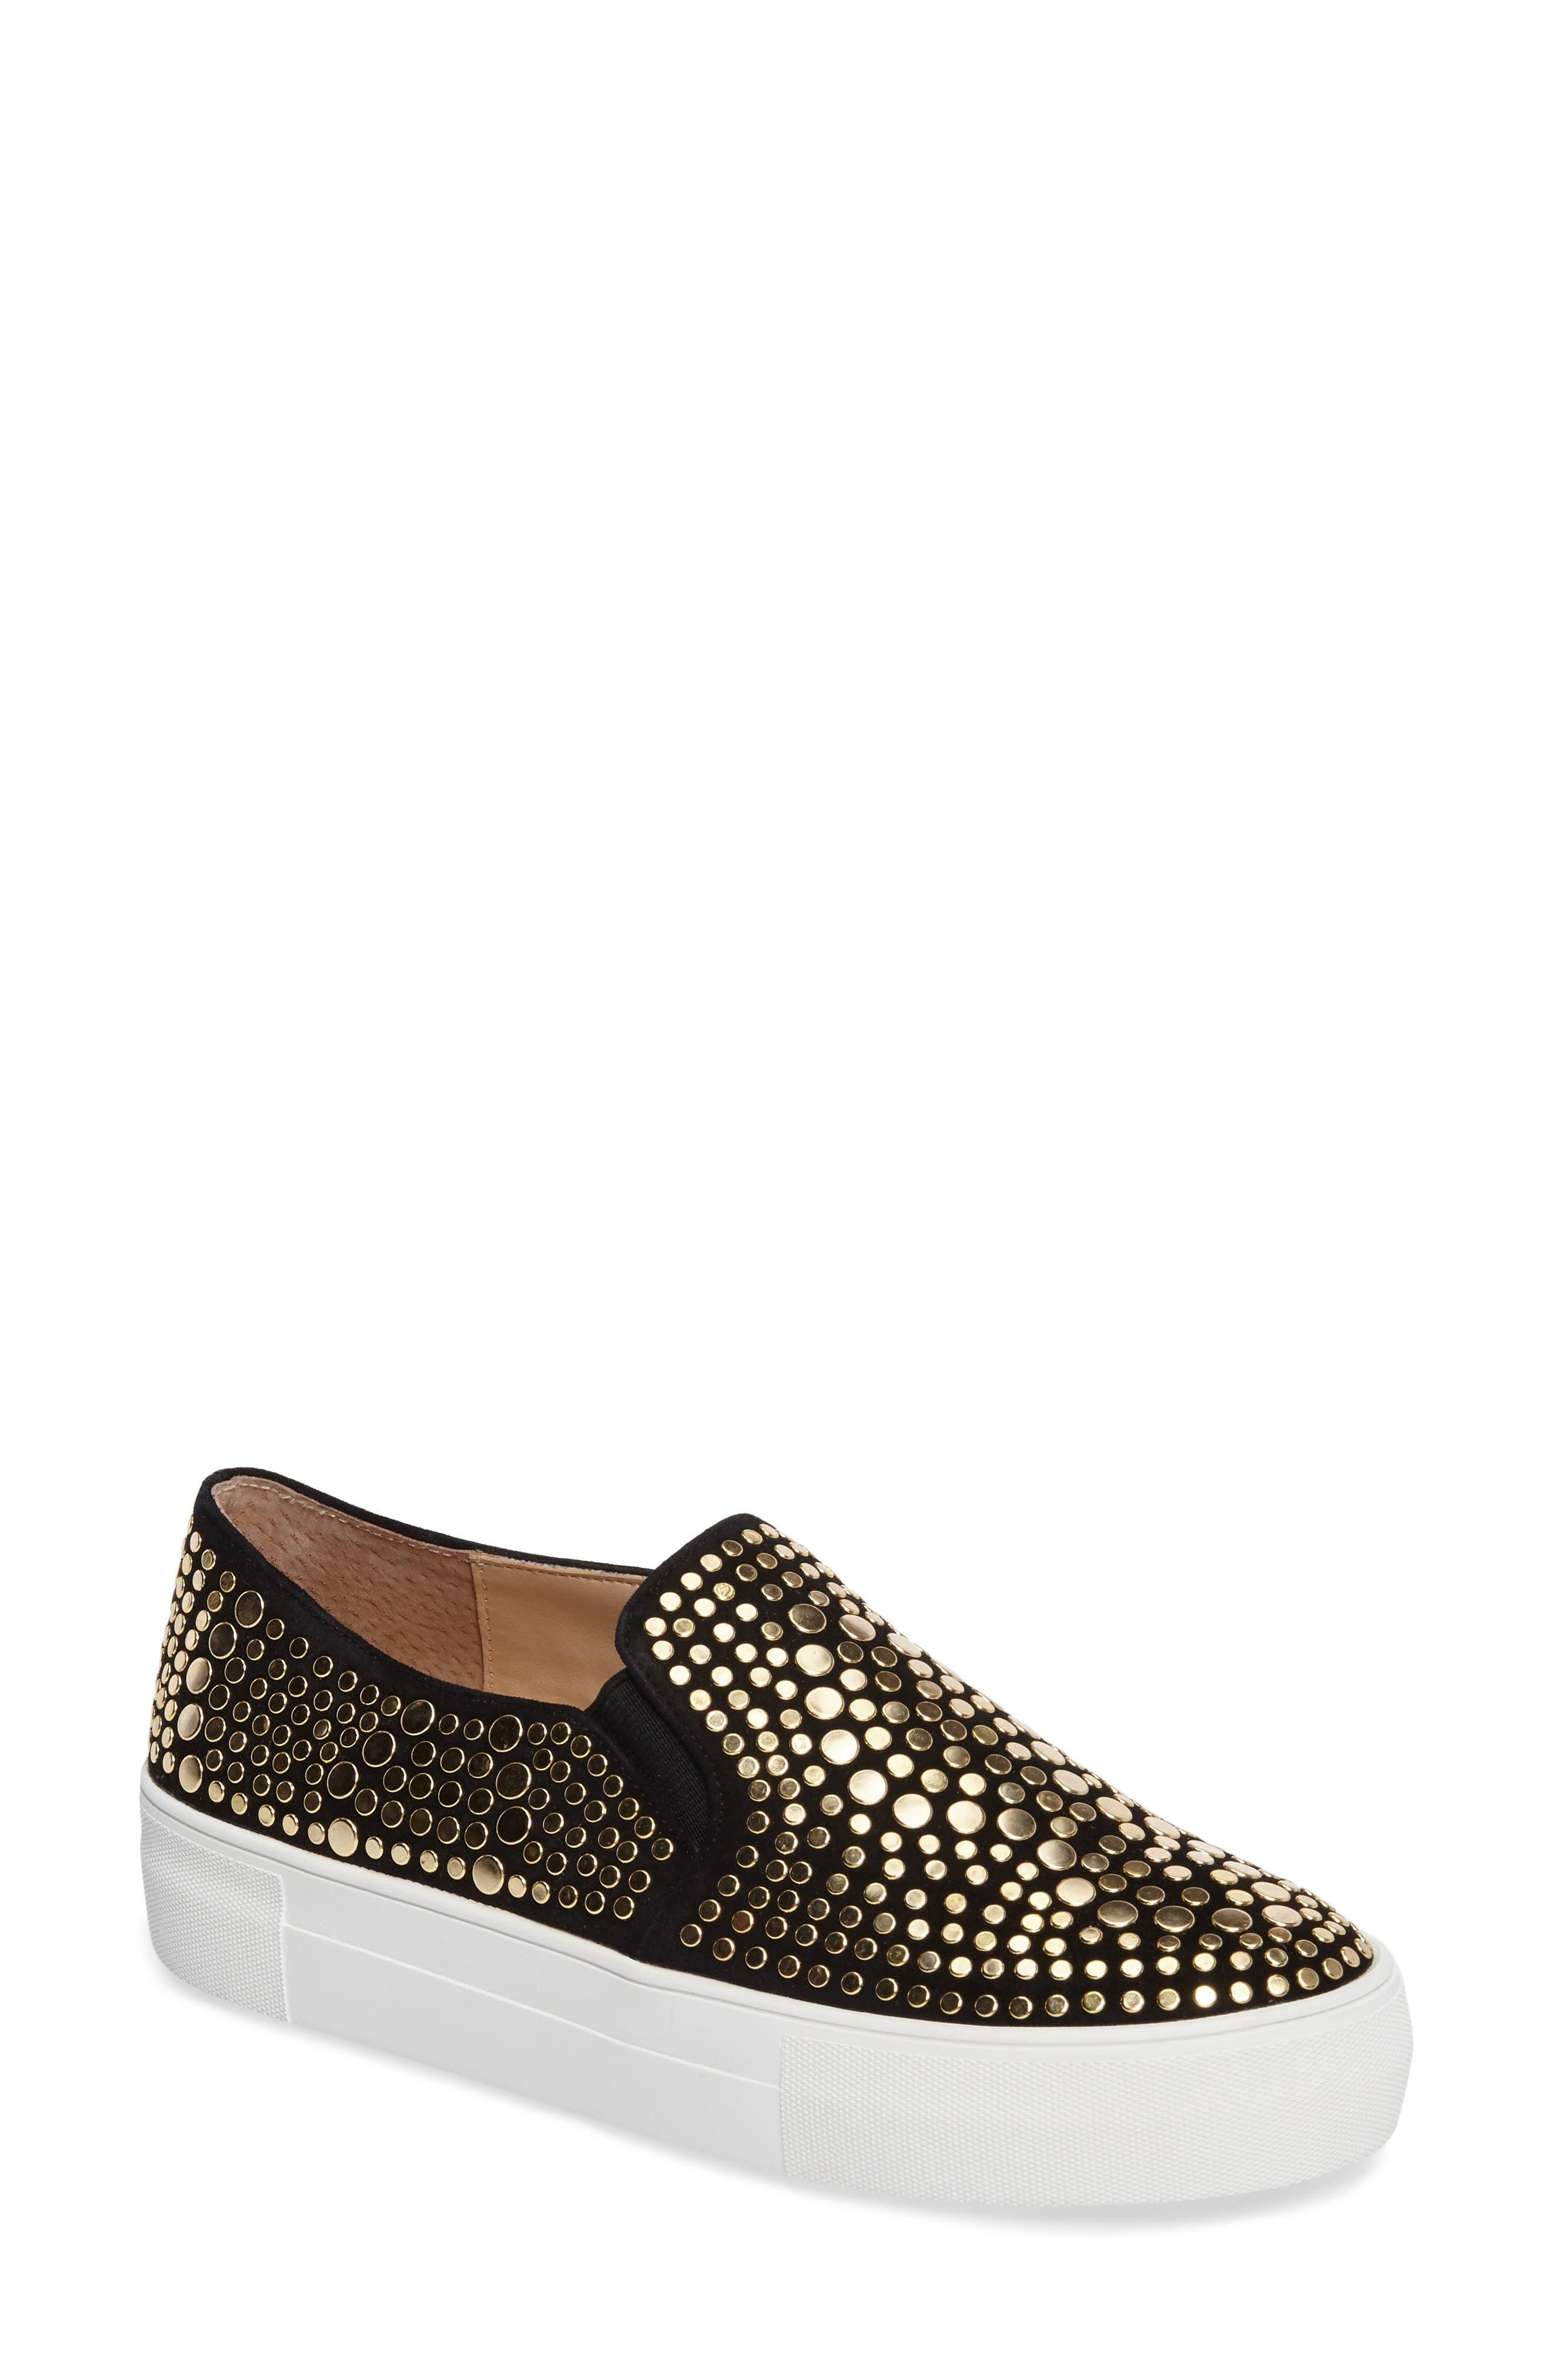 Alternate Image 1 Selected - Vince Camuto Kindra Stud Slip-On Sneaker (Women)